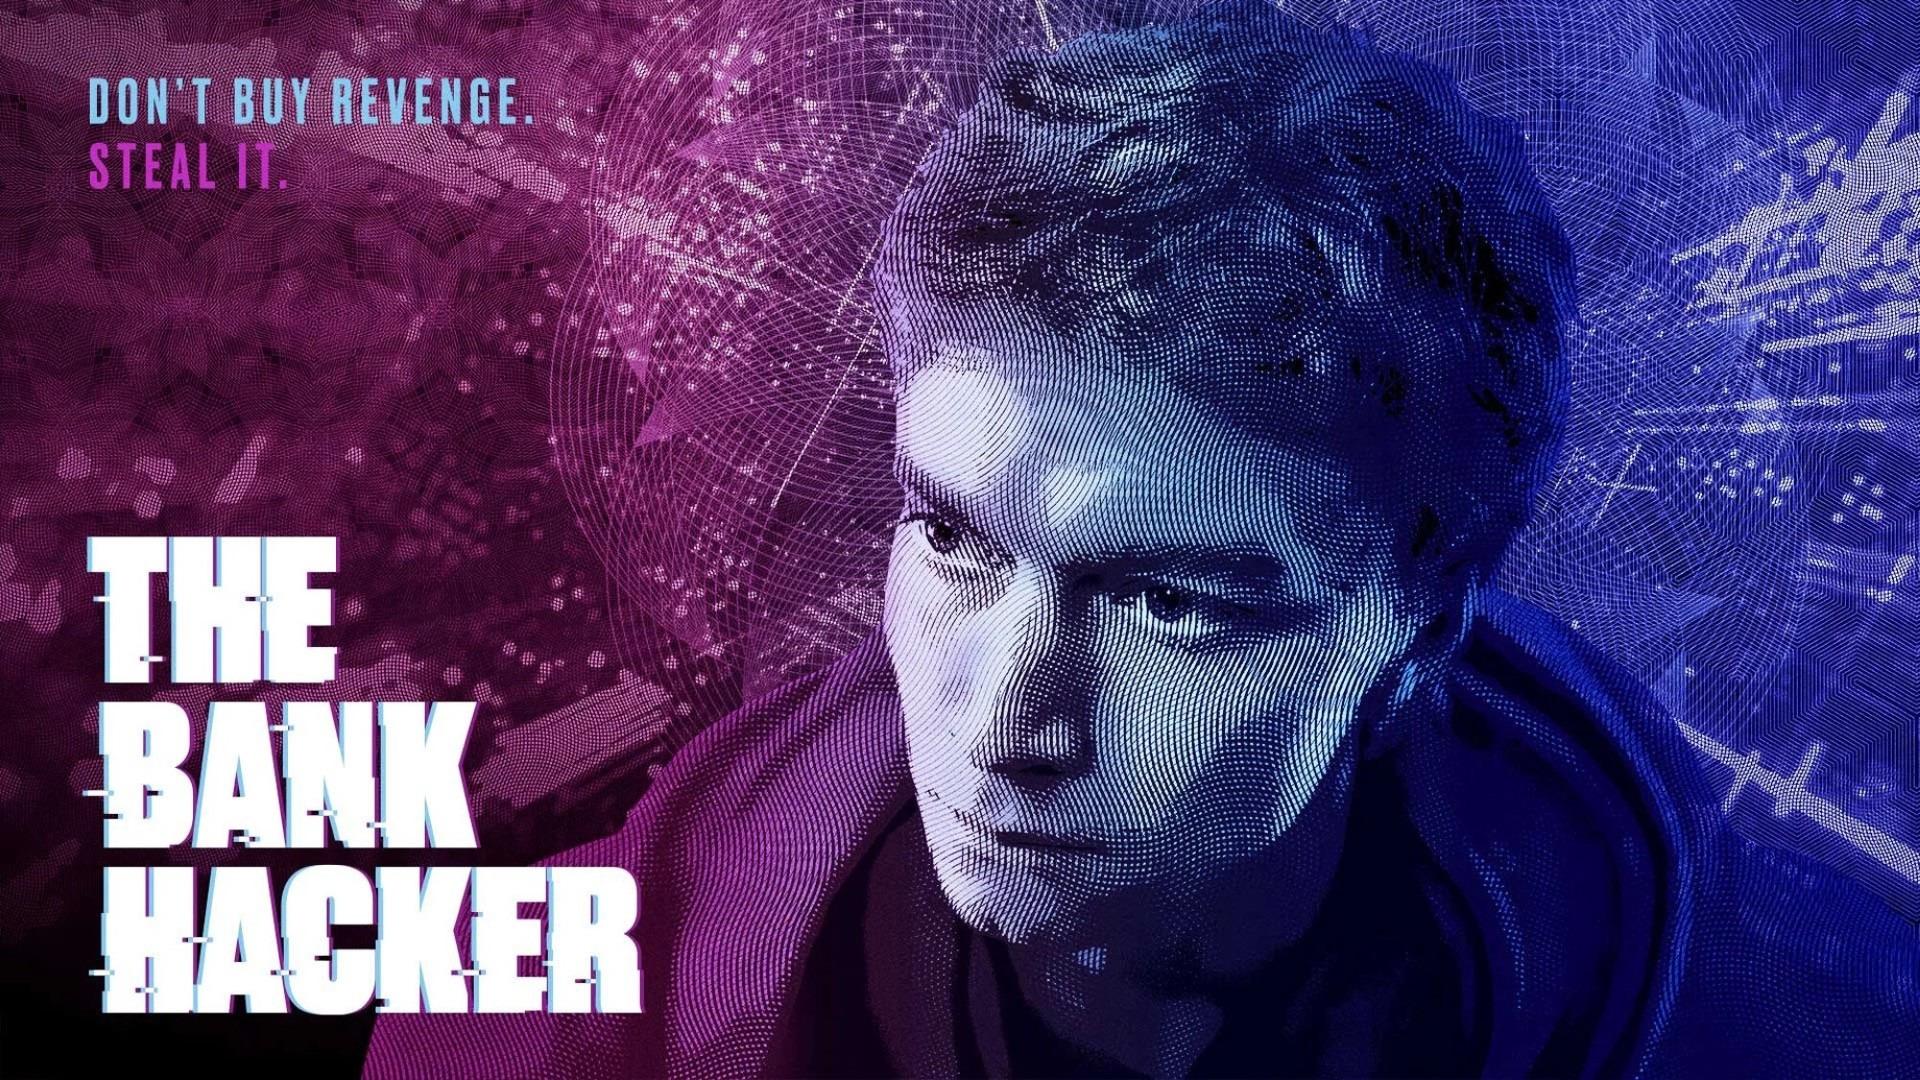 Show The Bank Hacker